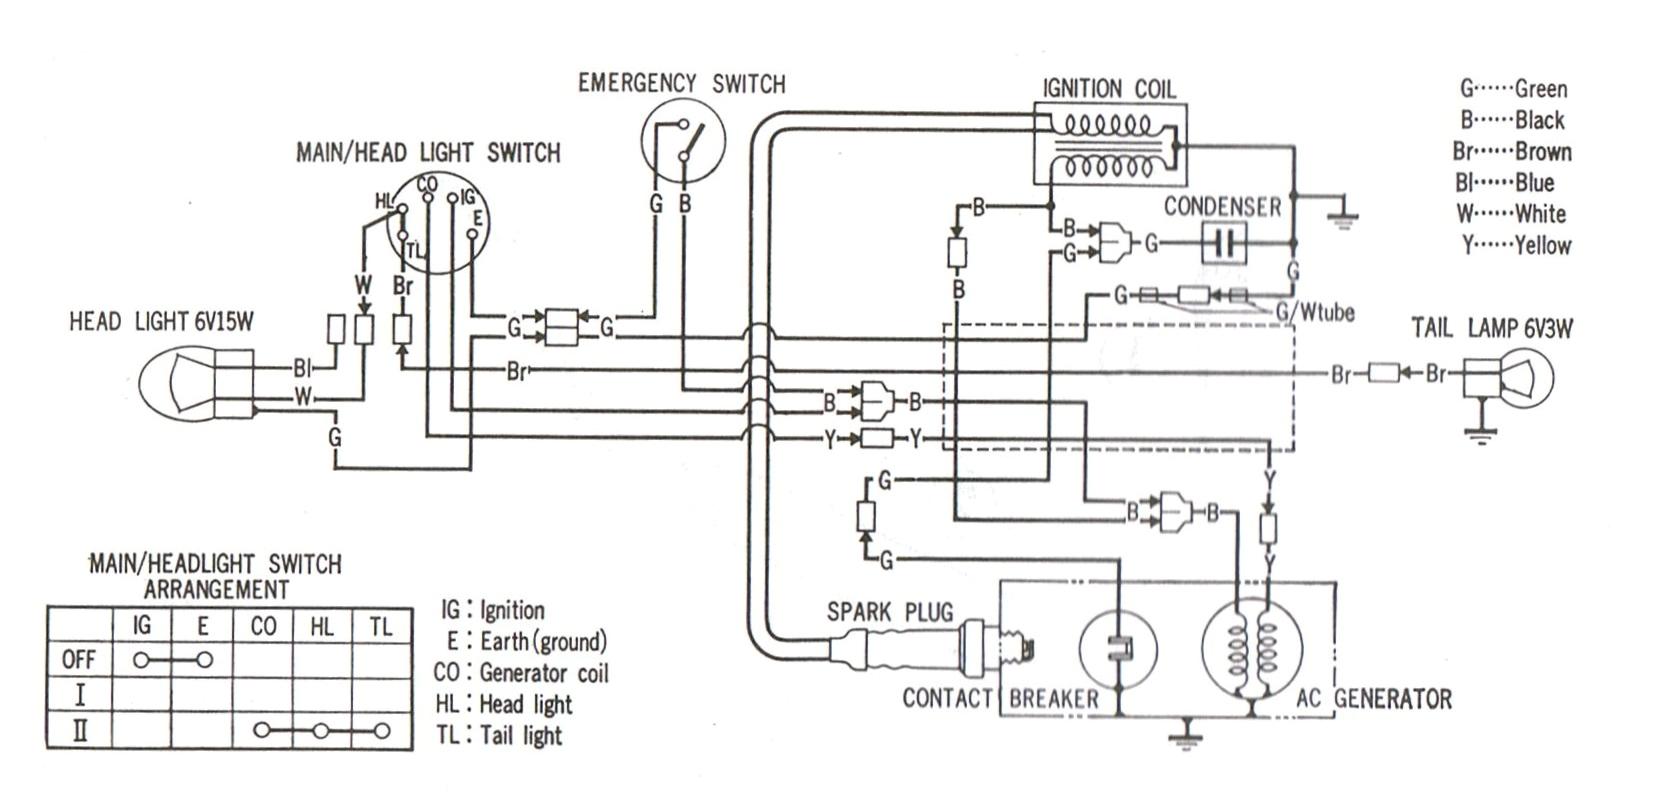 c70 wiring diagram wiring diagram expert fa c70 wiring diagram c70 wiring diagram